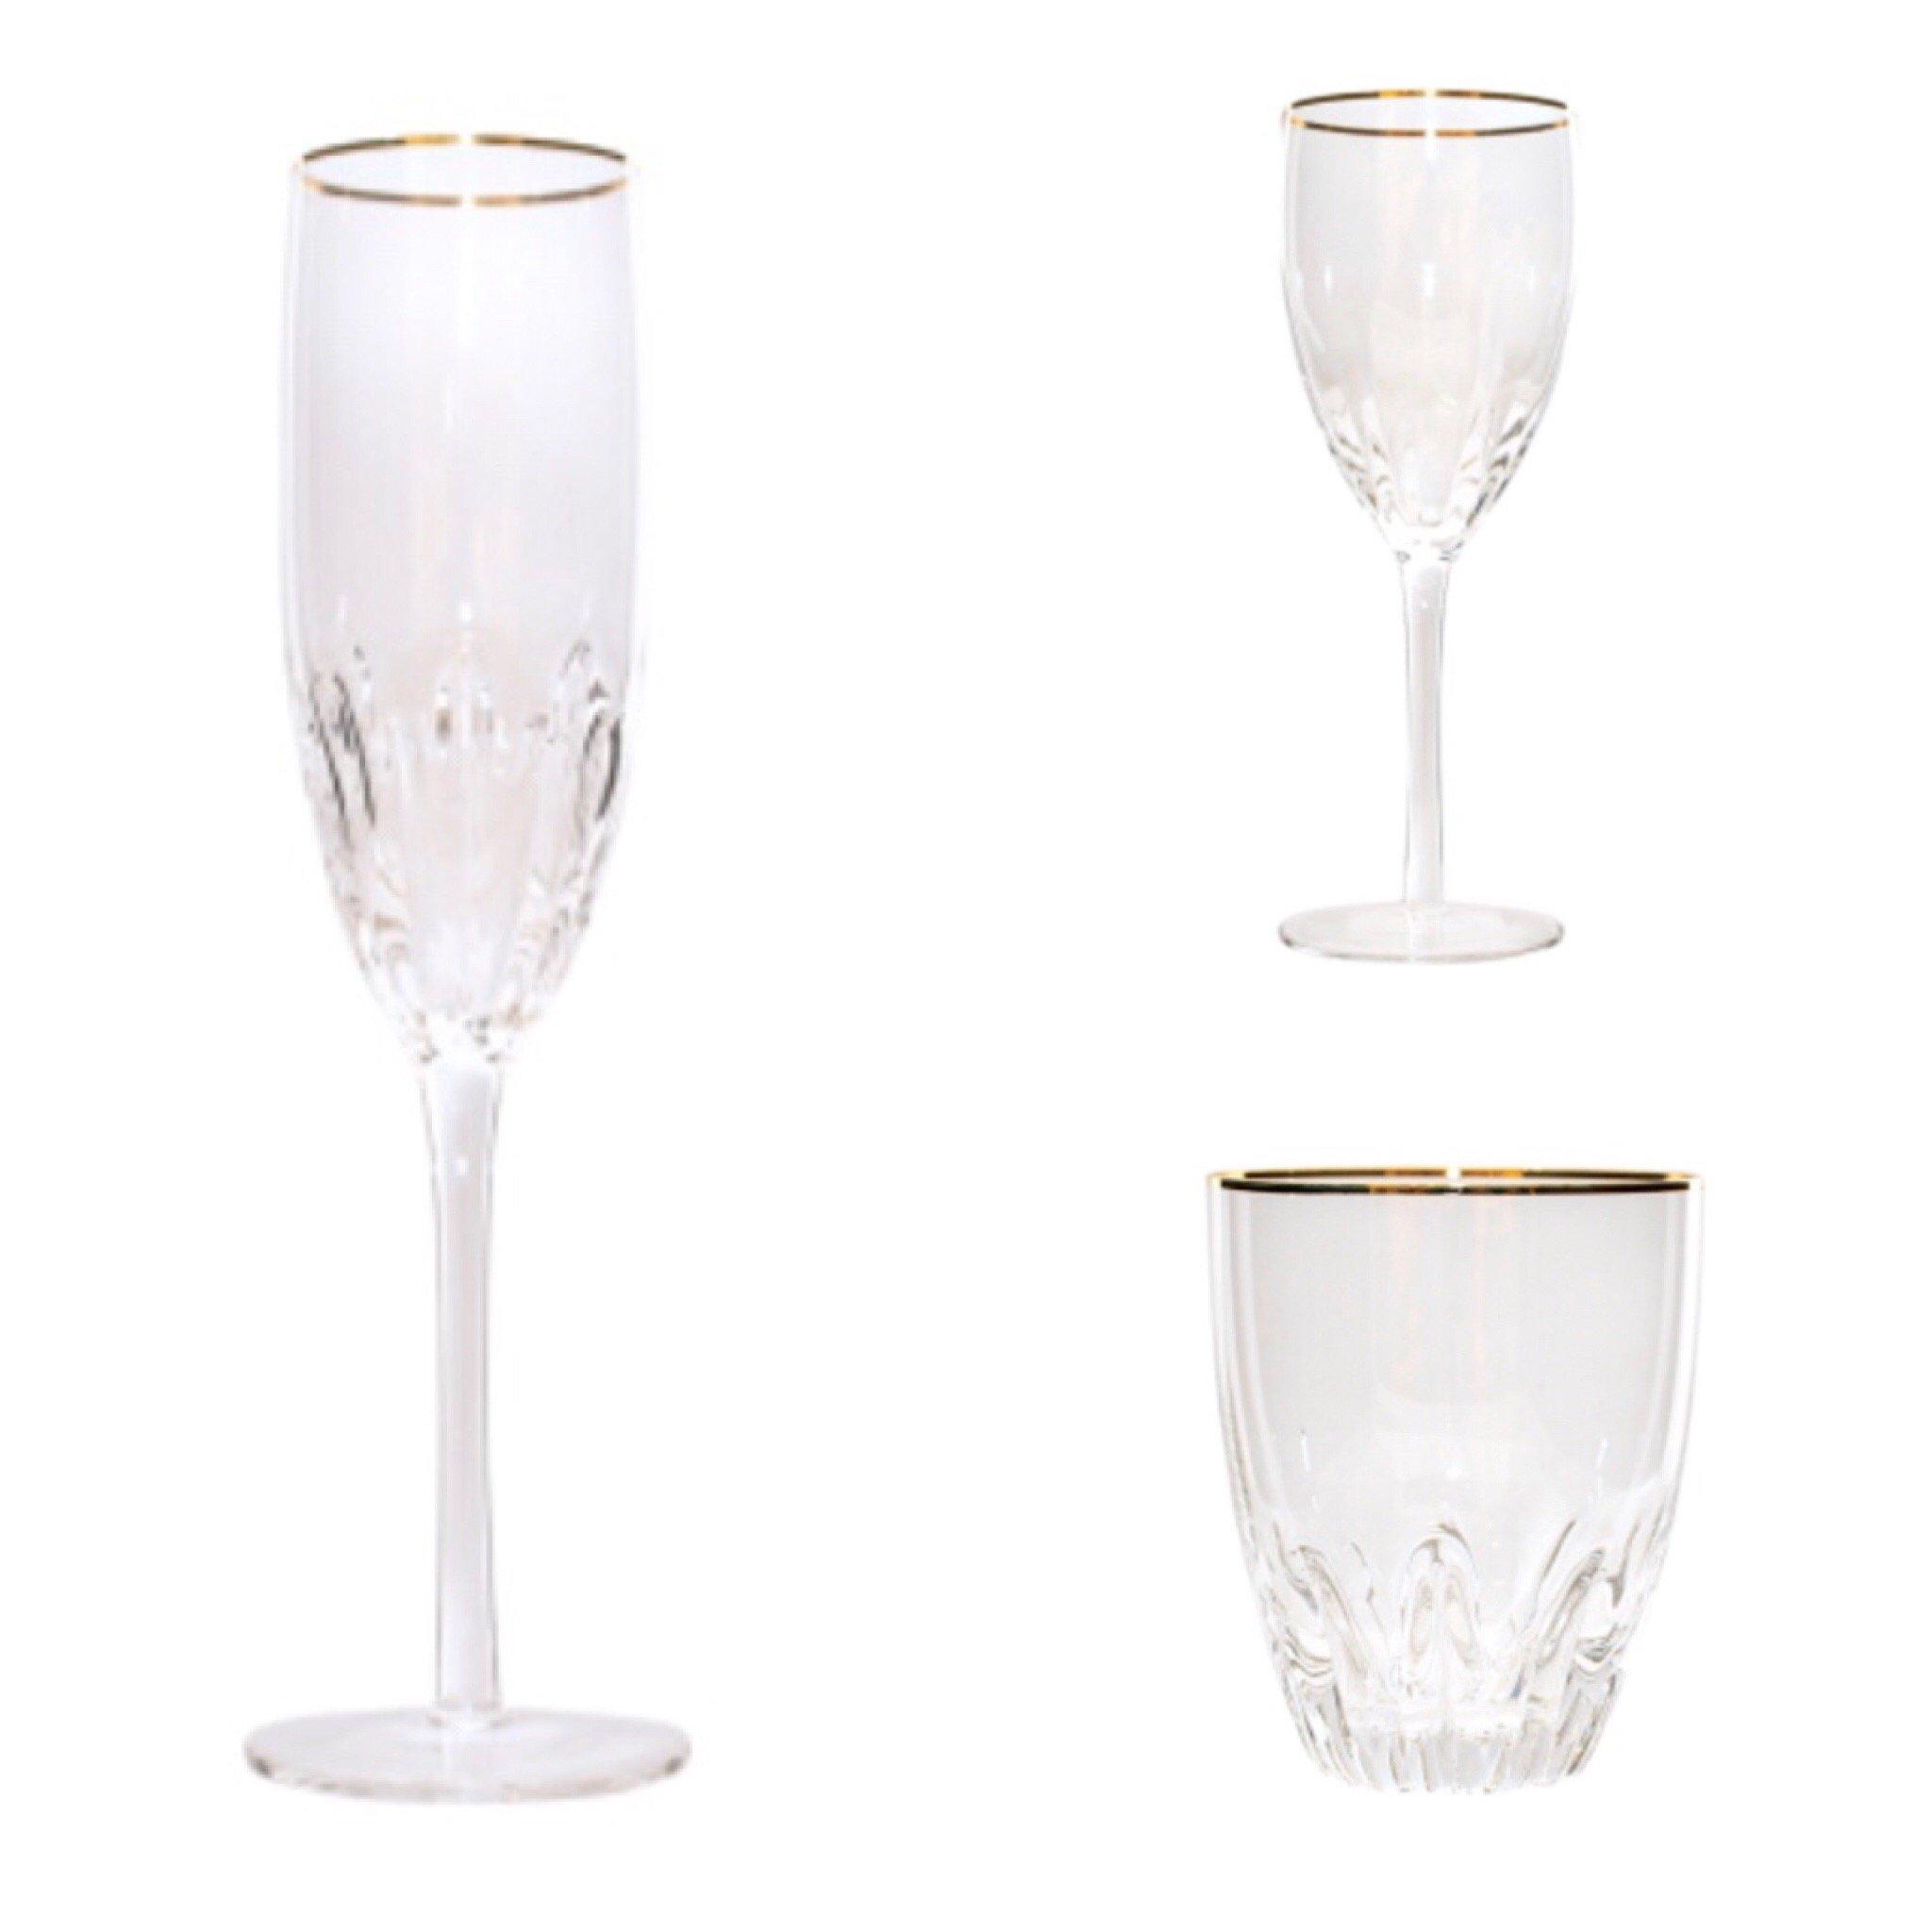 Gold Rim Glassware Set